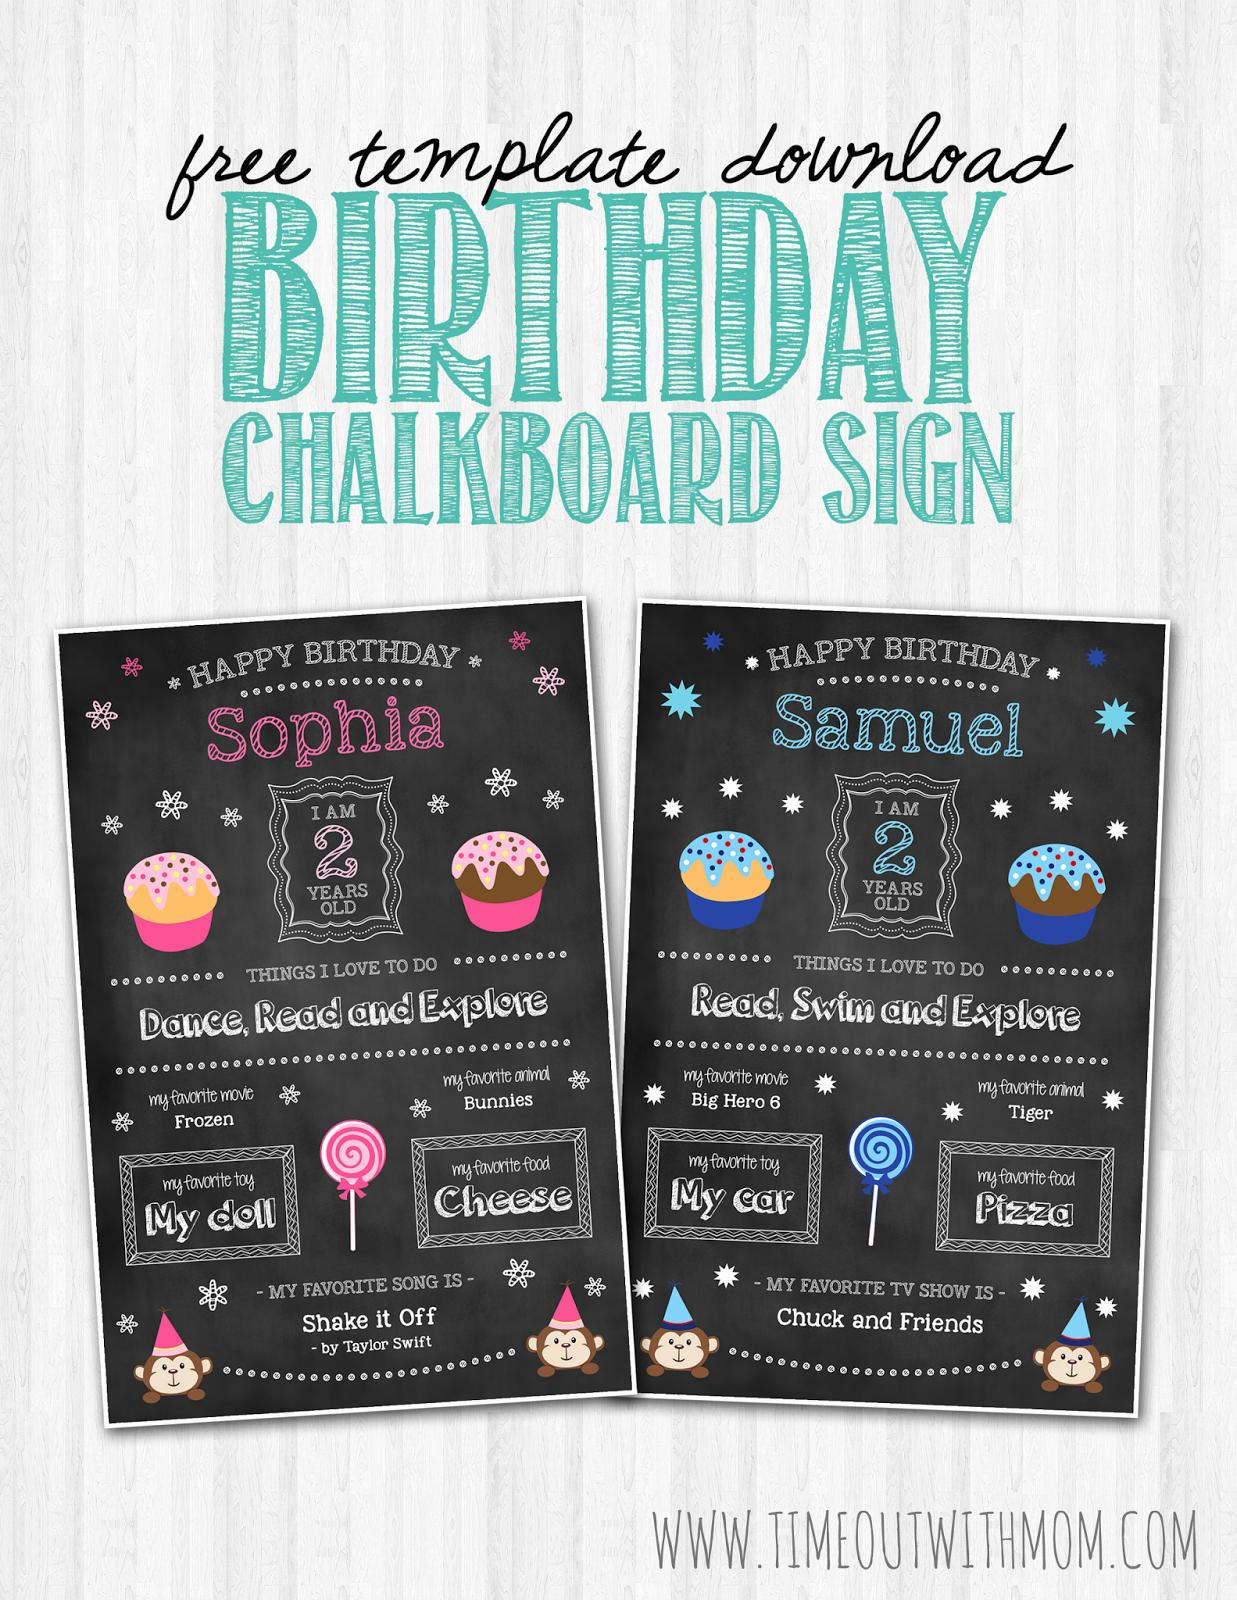 Birthday Chalkboard Template New Birthday Chalkboard Sign Template and Tutorial